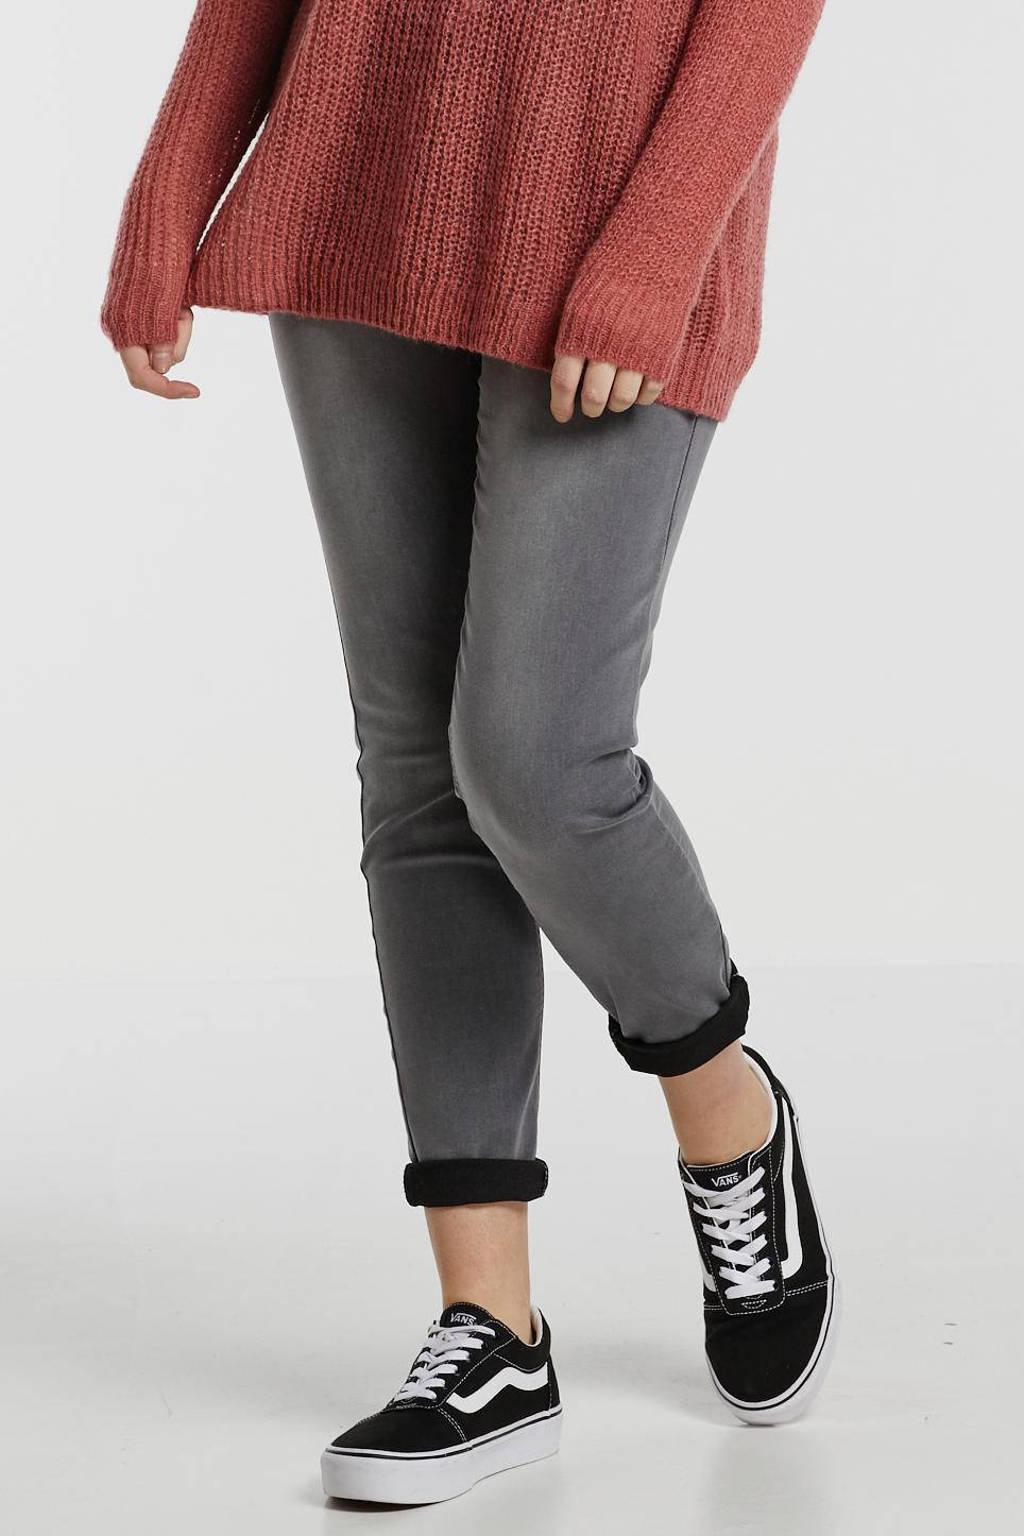 Yesta push-up slim fit jeans Joya grijs, Grijs